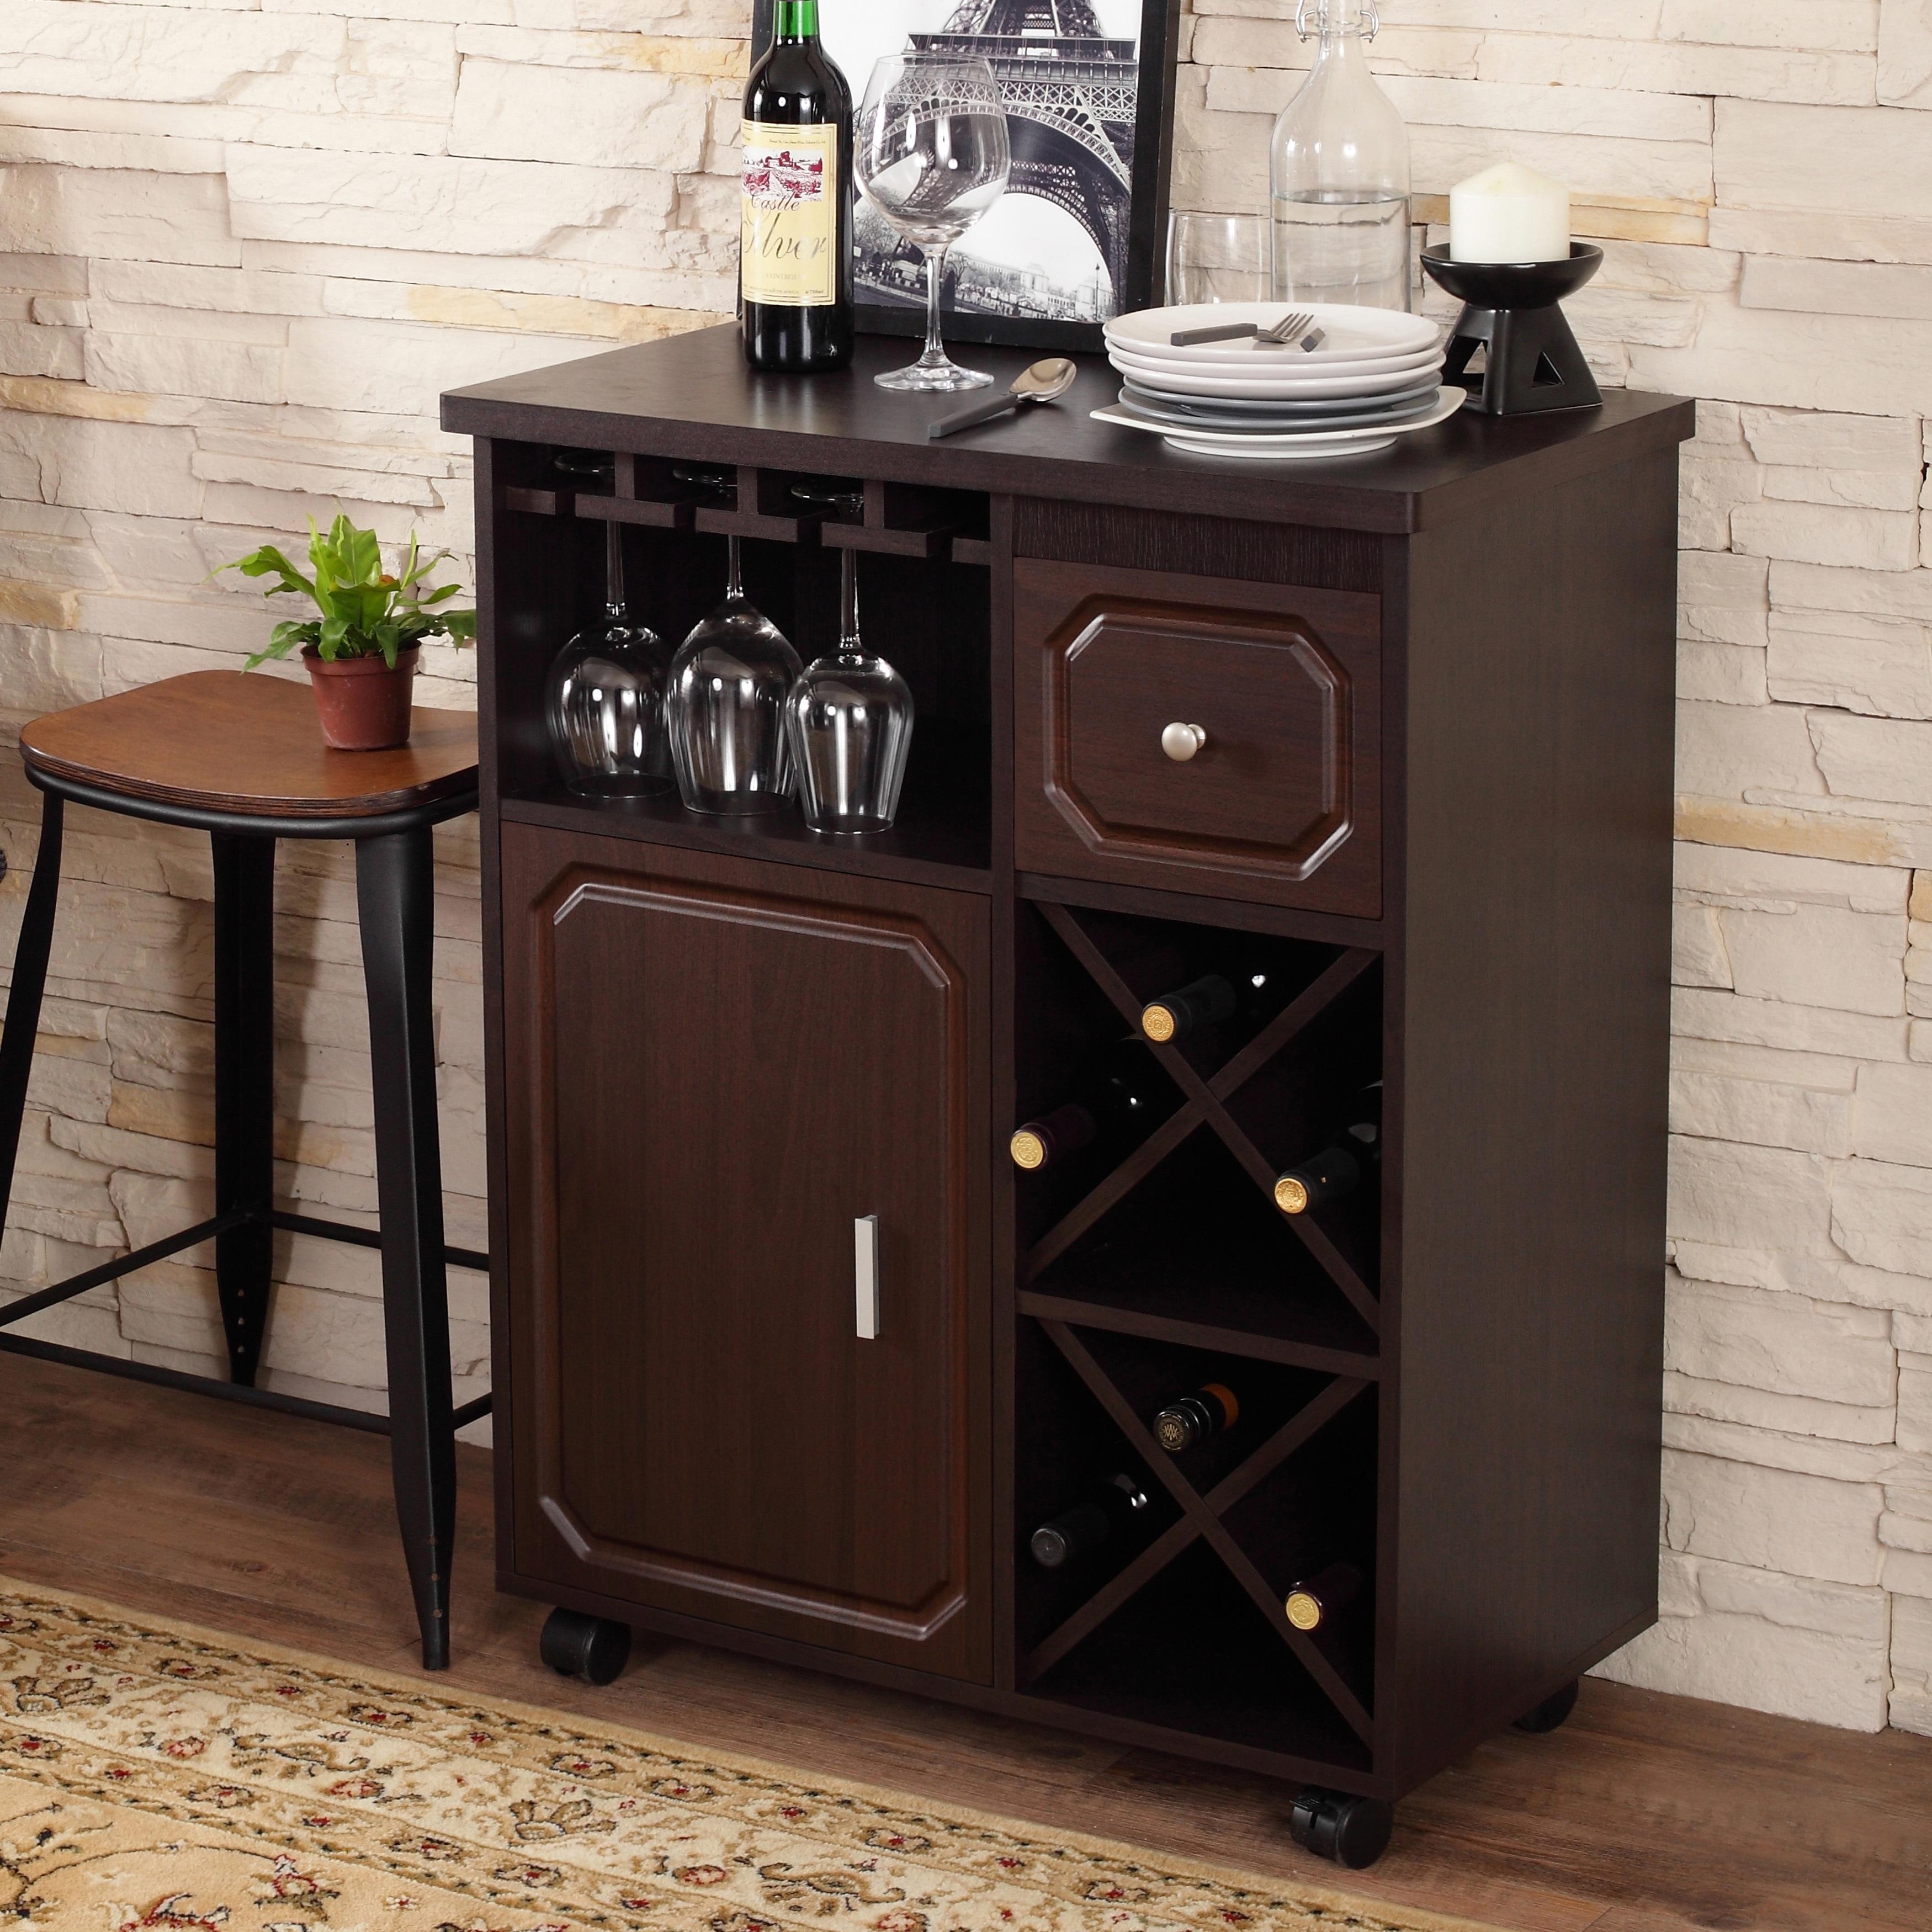 Furniture of America Crestall Multi-Storage Espresso Mobi...